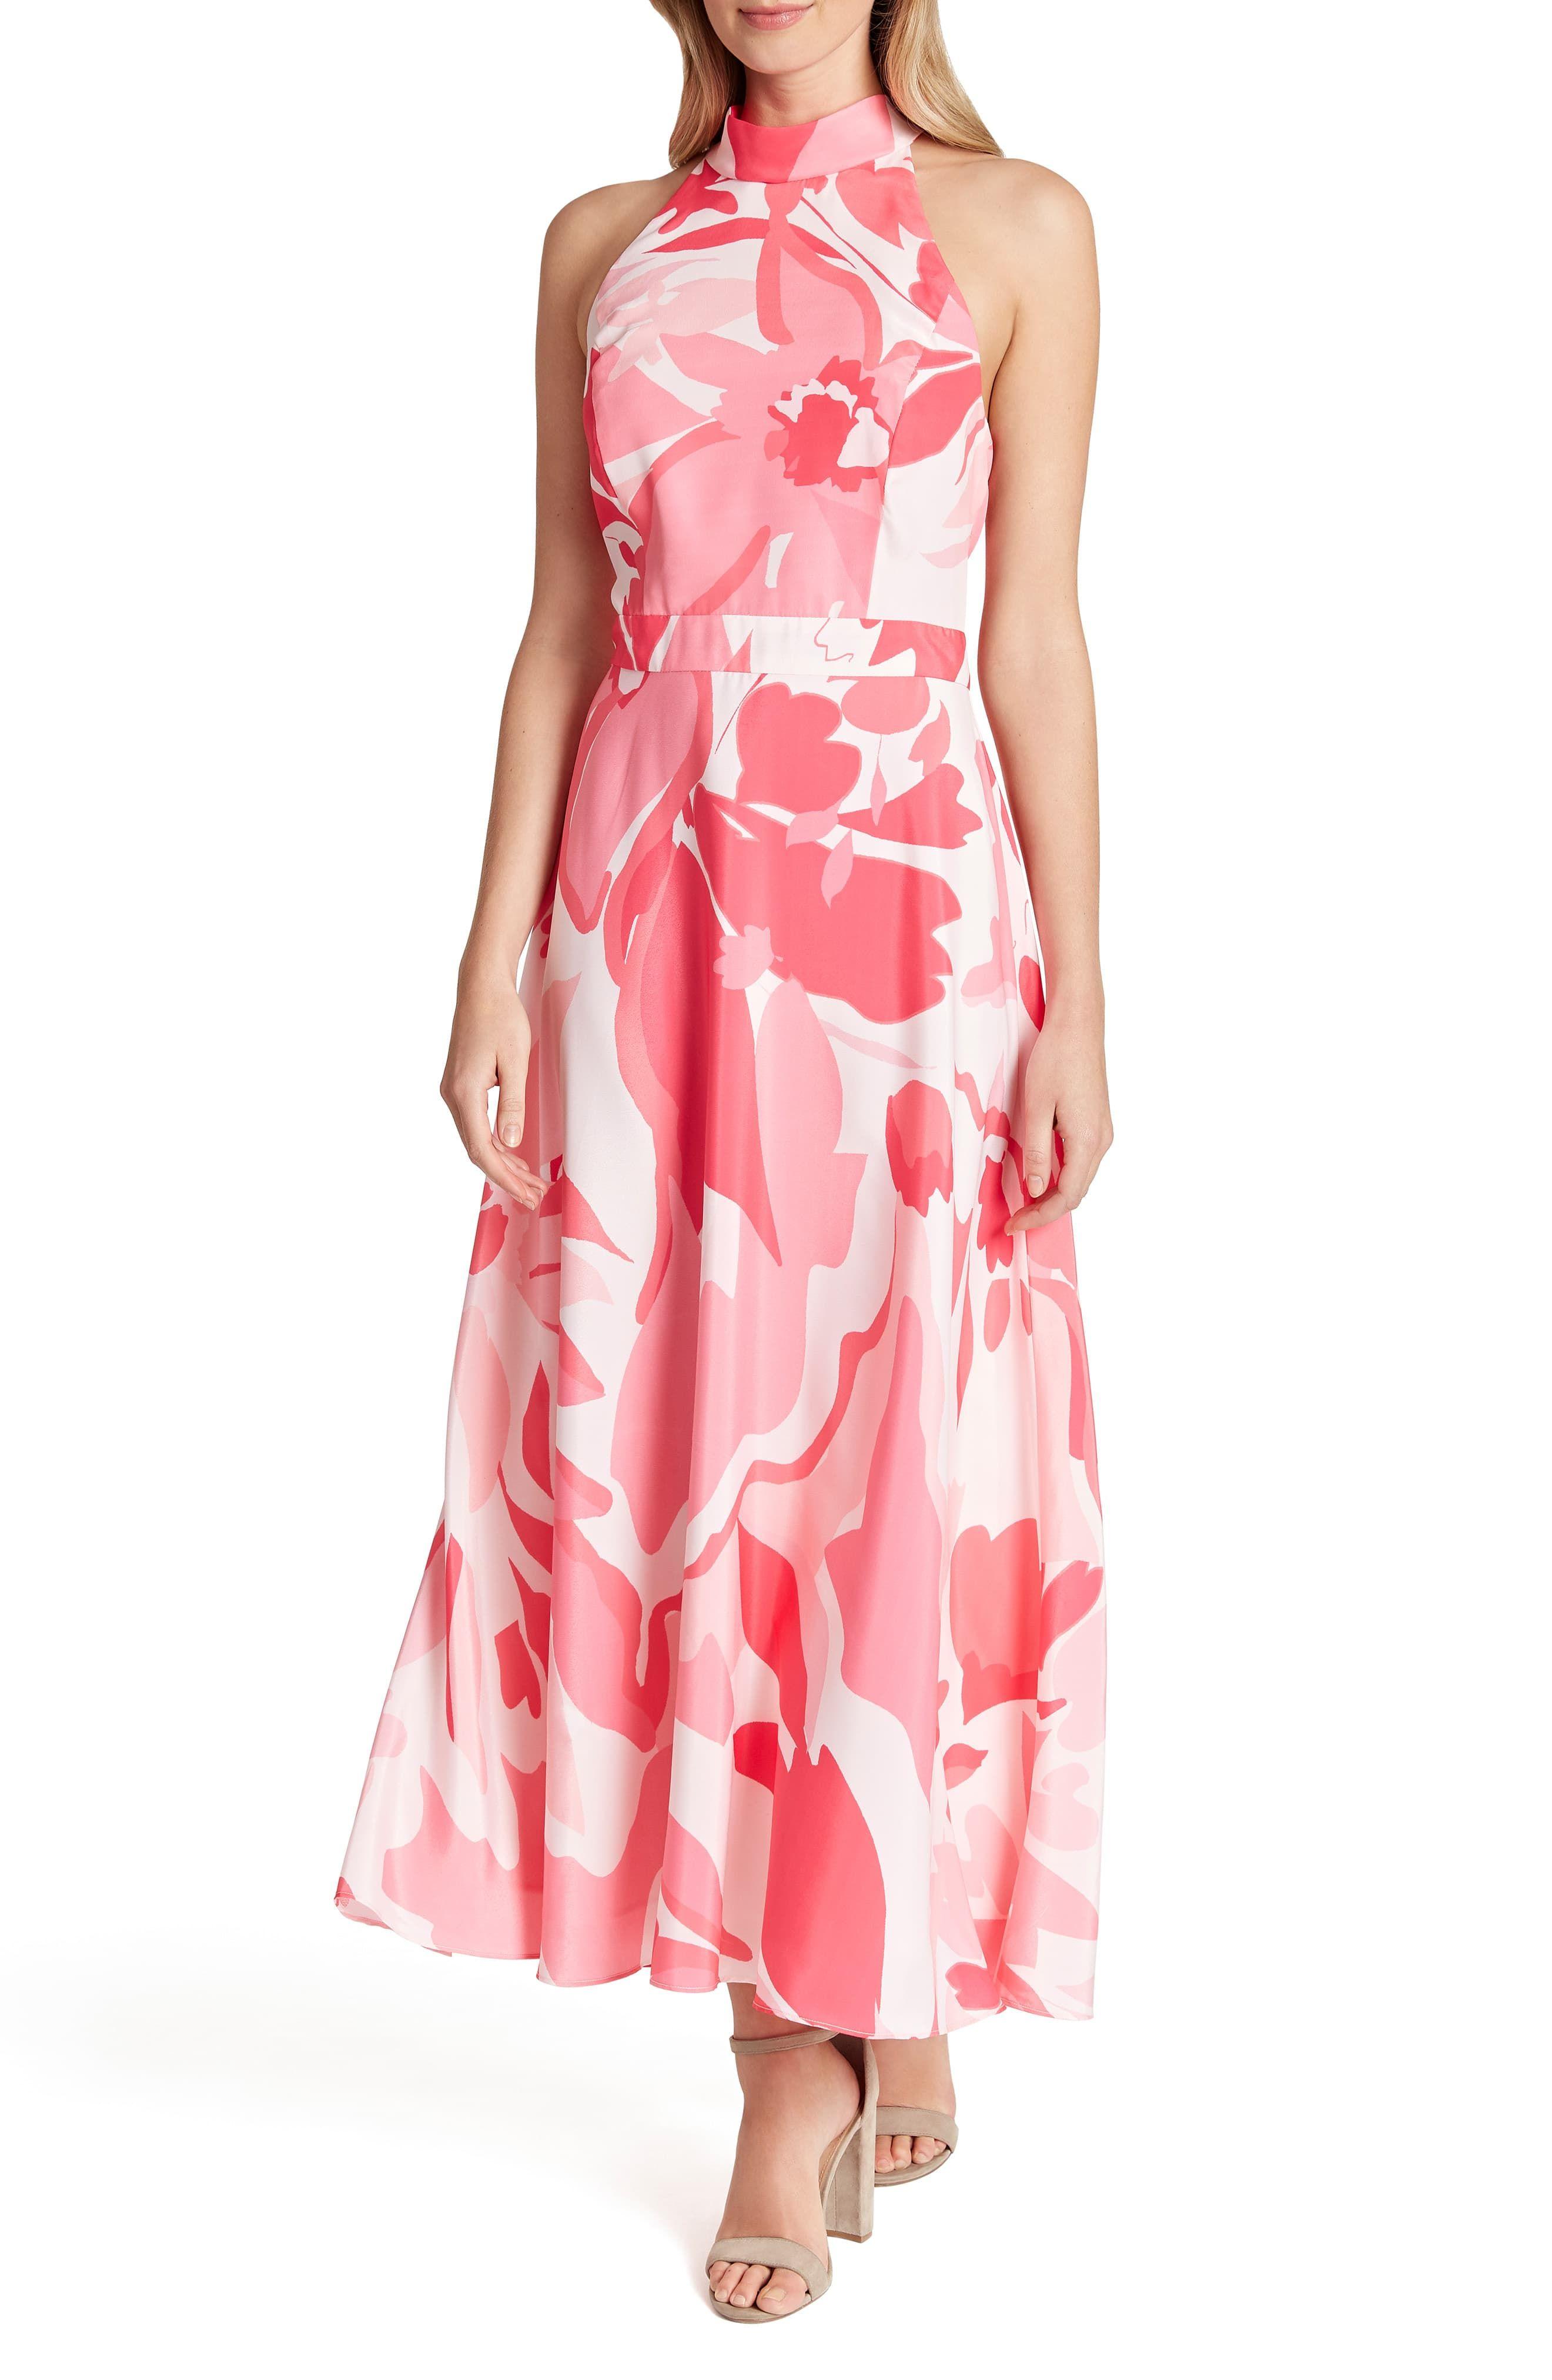 Tahari Printed Halter Maxi Dress Nordstrom Charmeuse Dress Halter Maxi Dresses Pink Maxi Dress [ 4048 x 2640 Pixel ]